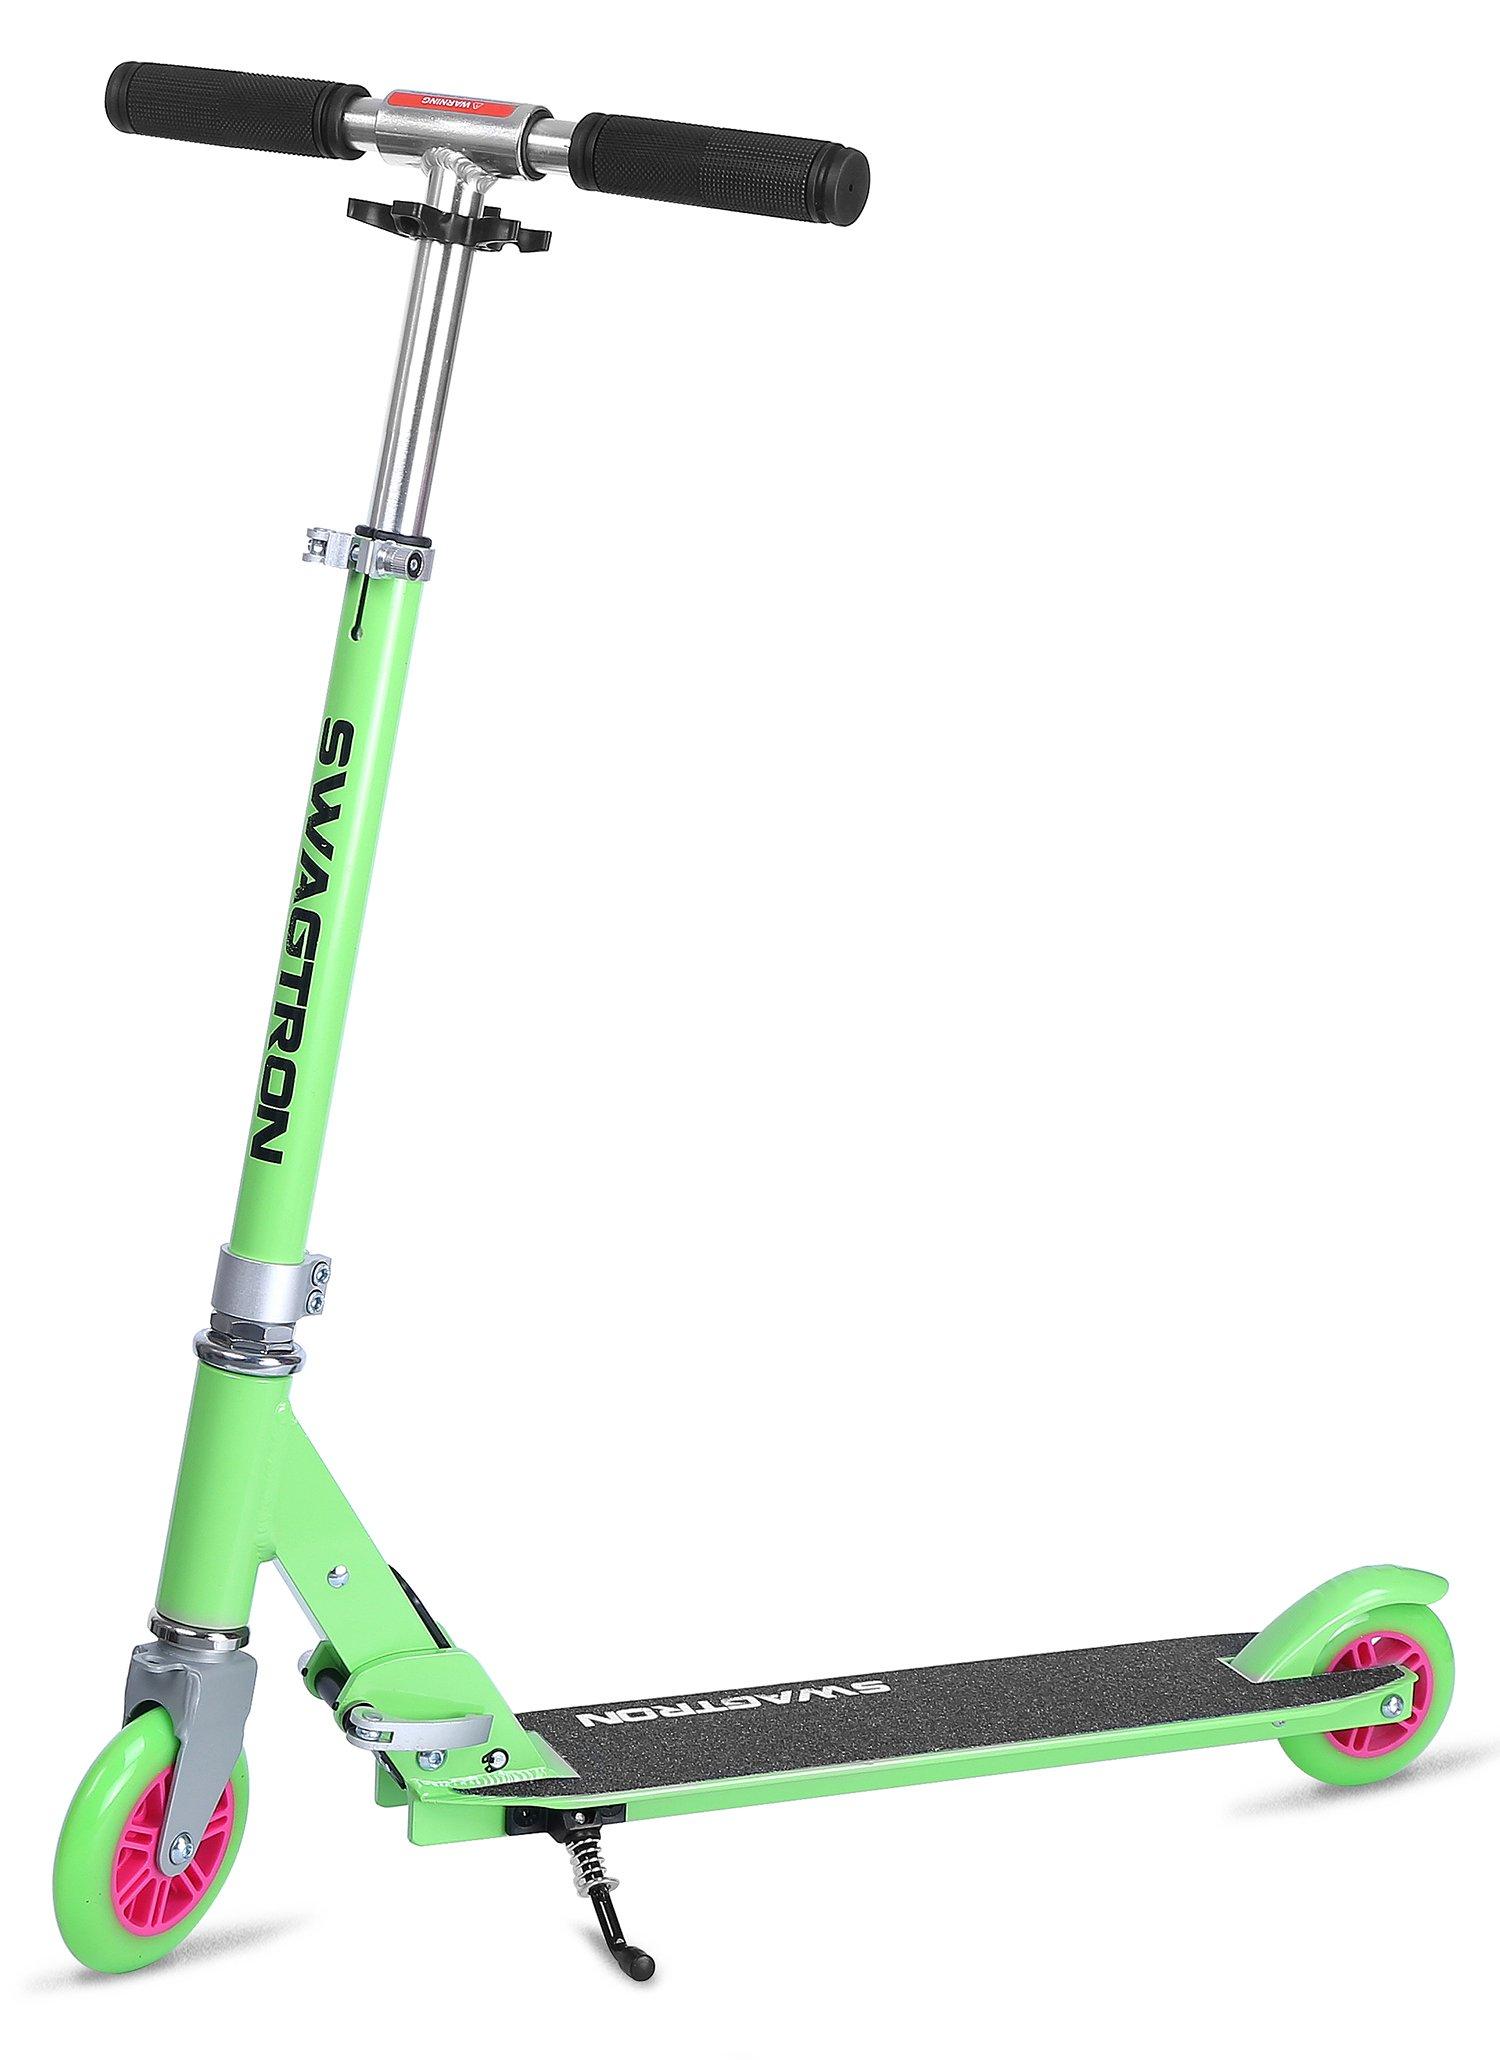 K1 Girl or Boy Kick Scooter 2 Wheel Adjustable 40'' Kids up to 72'' Teens, 220Lb Weight Limit, ABEC-9 Bearings, Lightweight 6.42Lbs, Next Gen Fold-n-Lock System + Kickstand (Green/Pink) by Swagtron